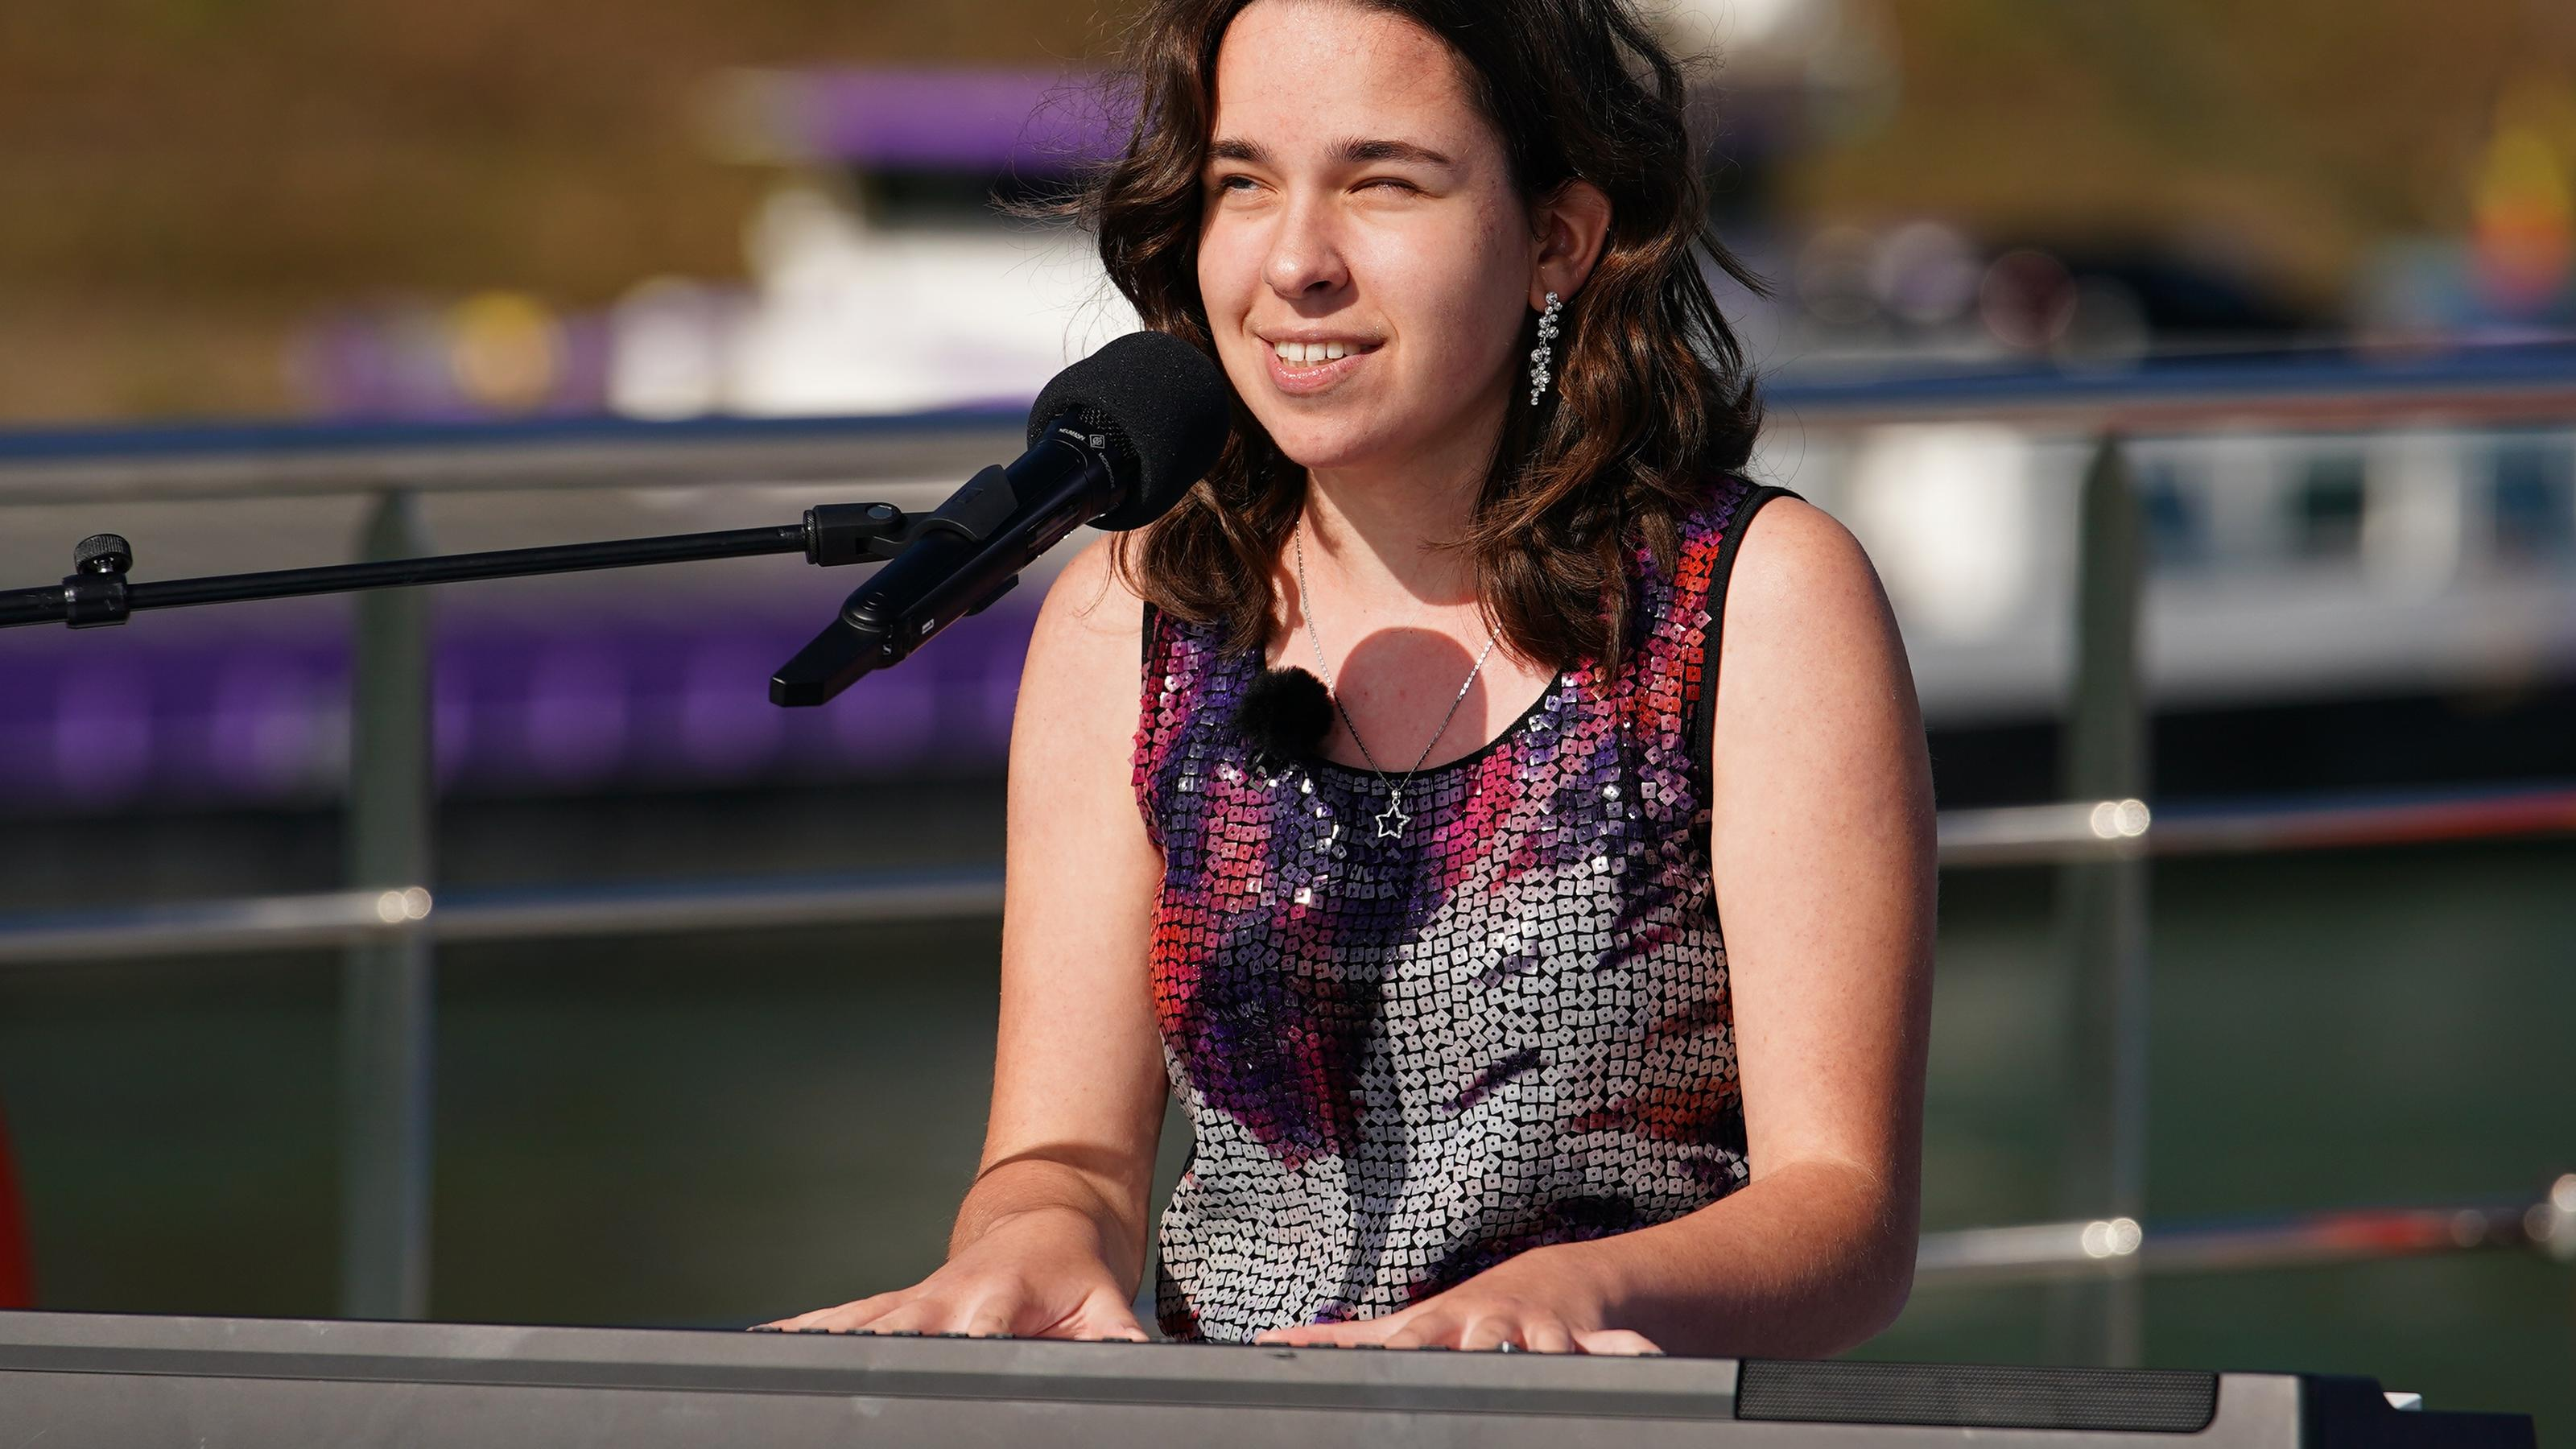 DSDS 2021: Die blinde Sängerin Anastasia Cibulnik begeistert die Jury am Piano - RTL Online